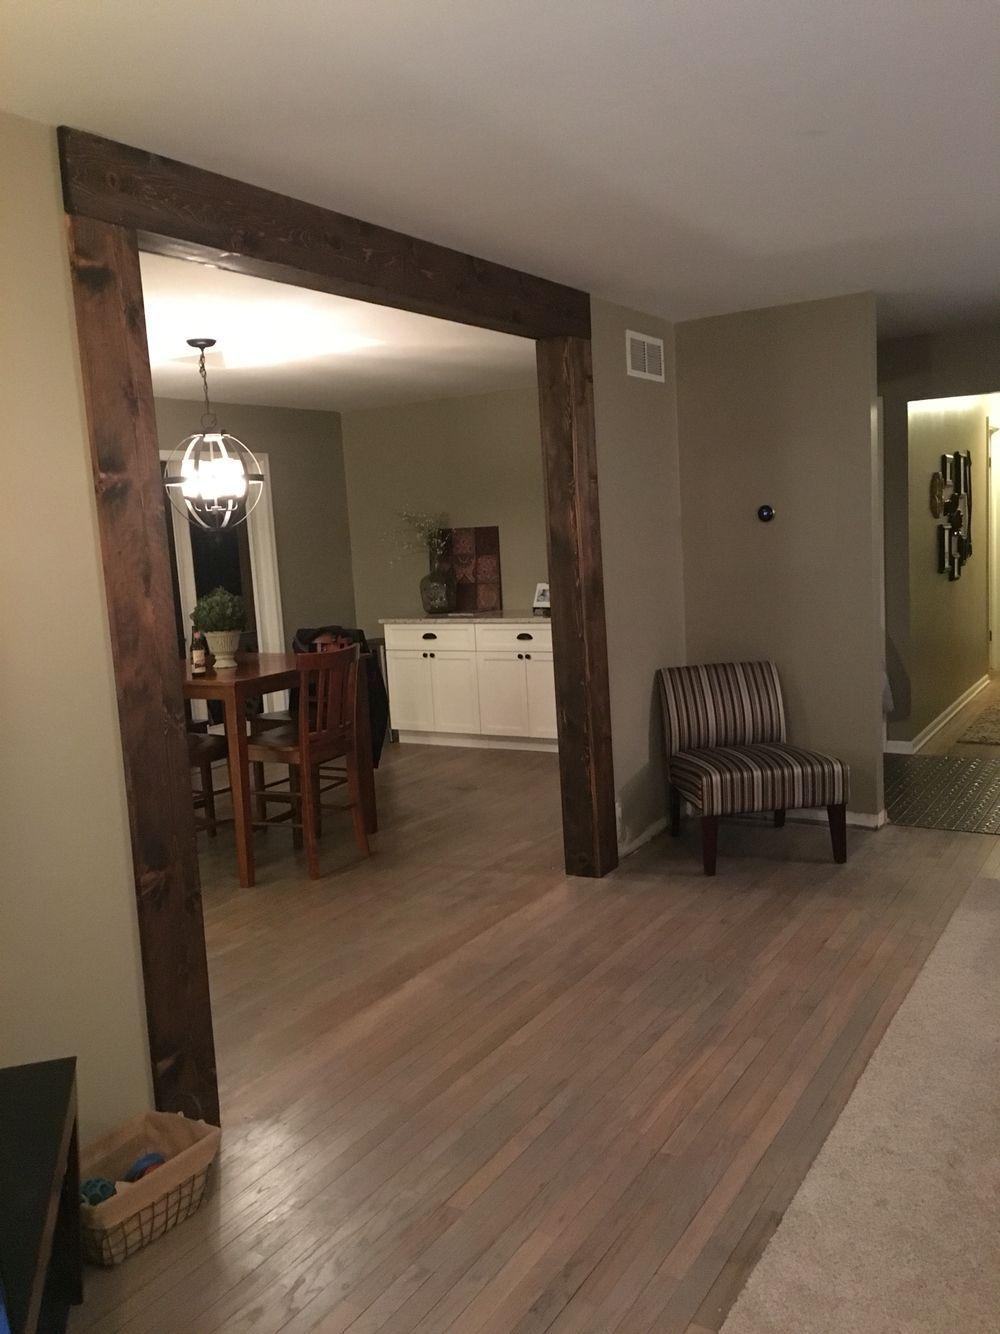 The Way to Thoroughly Clean Dark Hardwood Floor #rusticwoodprojects